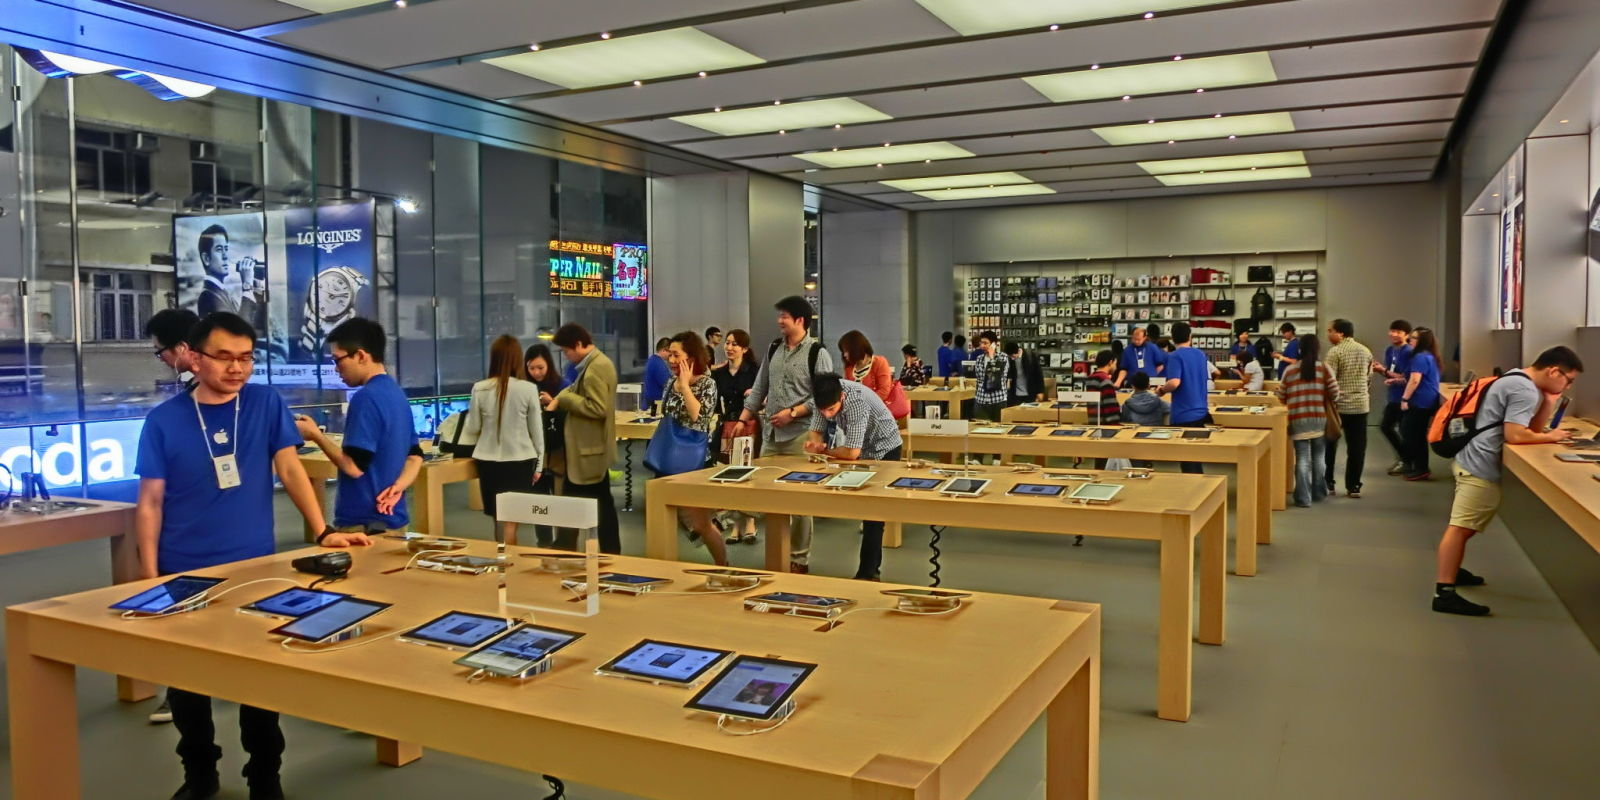 Apple Store Overhaul: Genius Bars Will See the Biggest ...